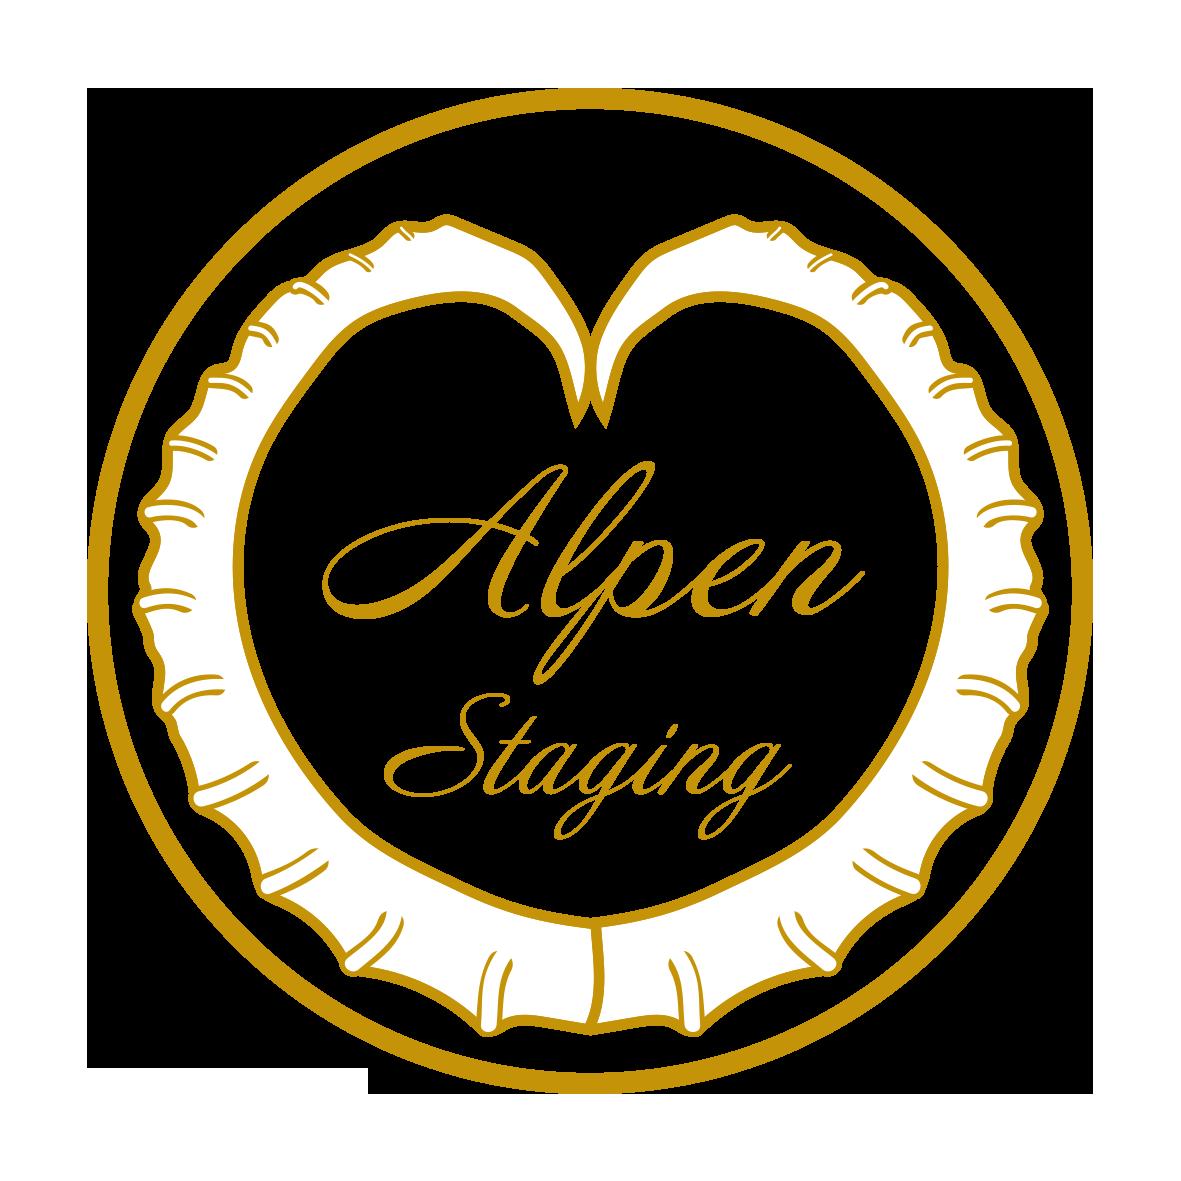 Alpenstaging